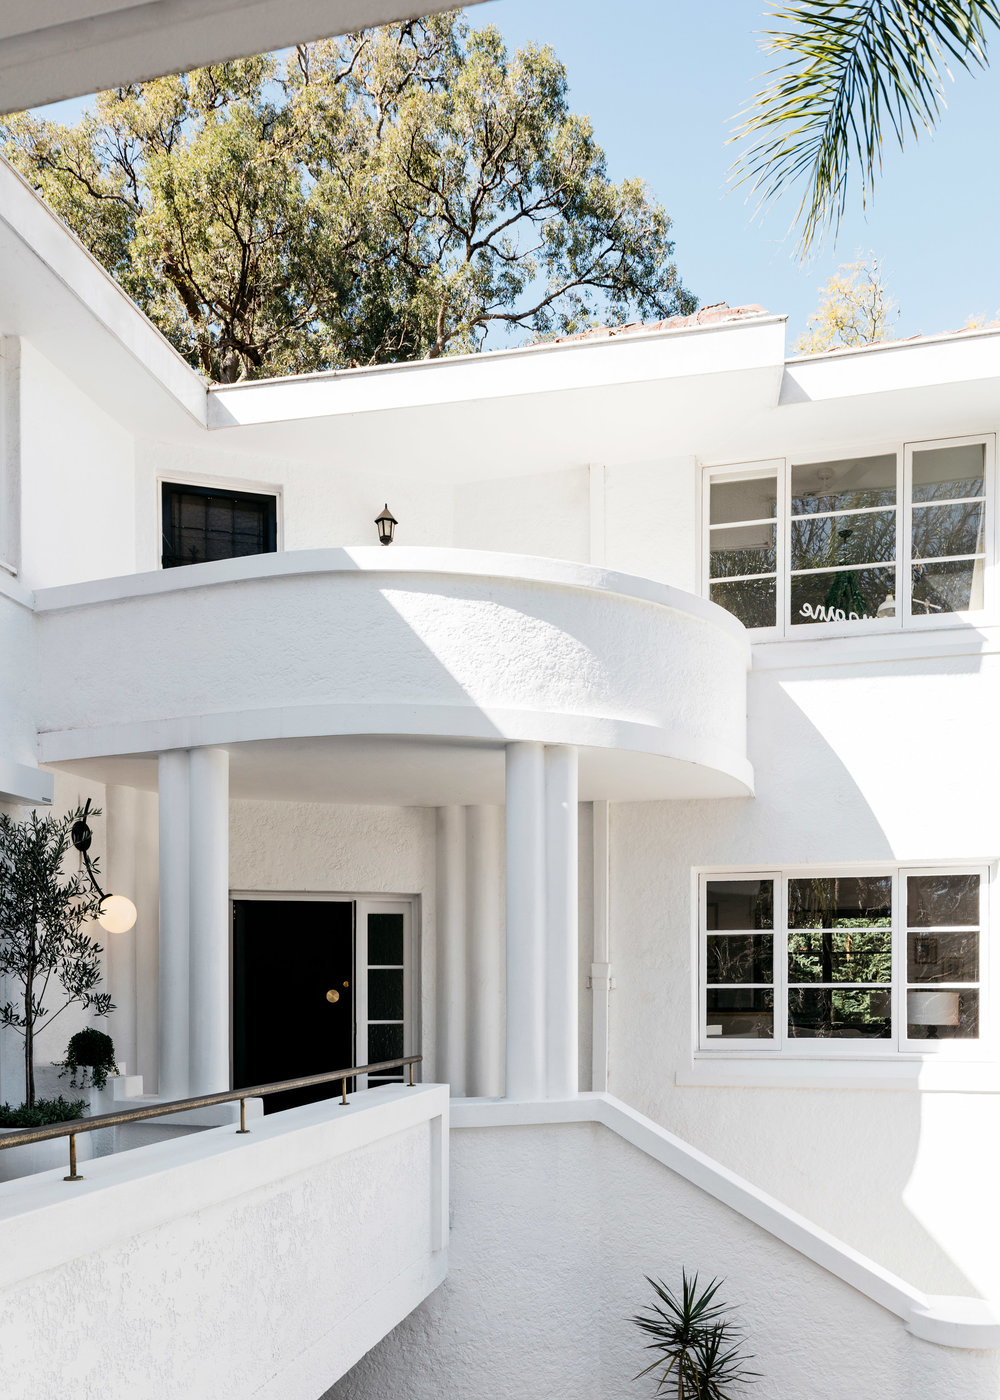 curatorial-house-arent-pyke-interiors-residential-australia-sydney_dezeen_2364_col_6.jpg